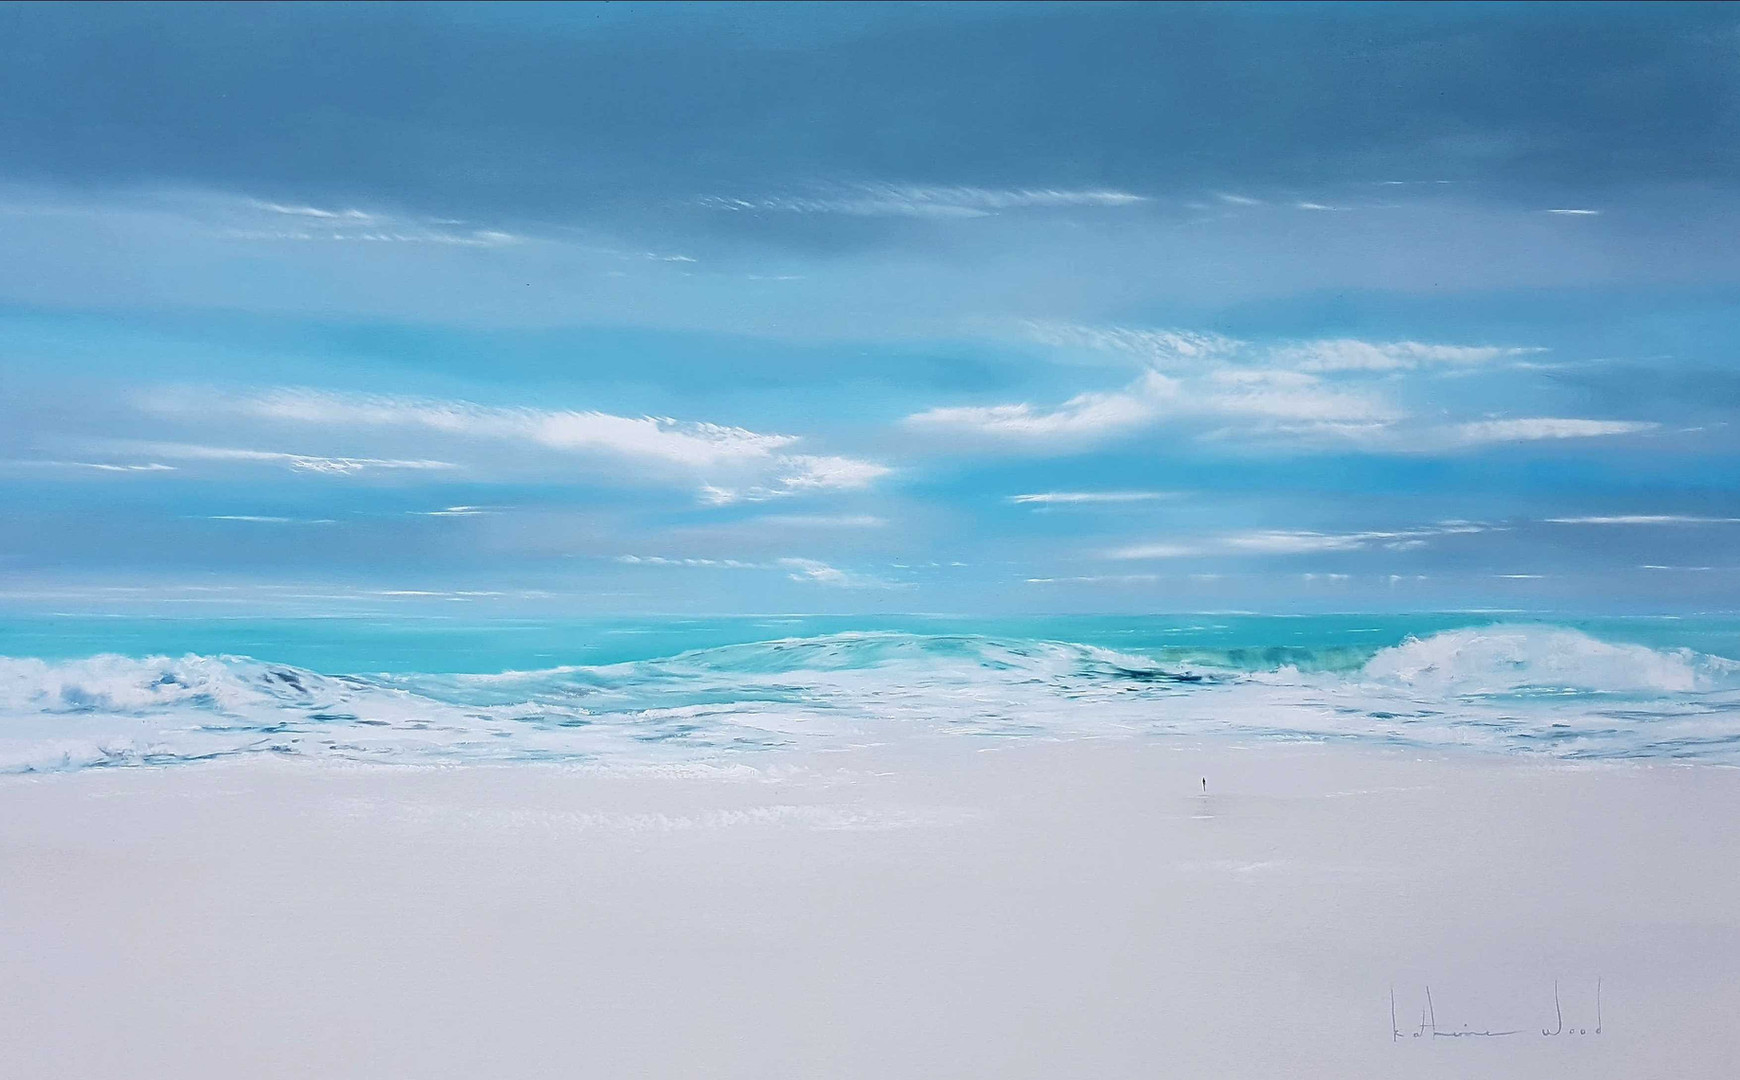 Sandy shores 1.6x1 check size web.jpg